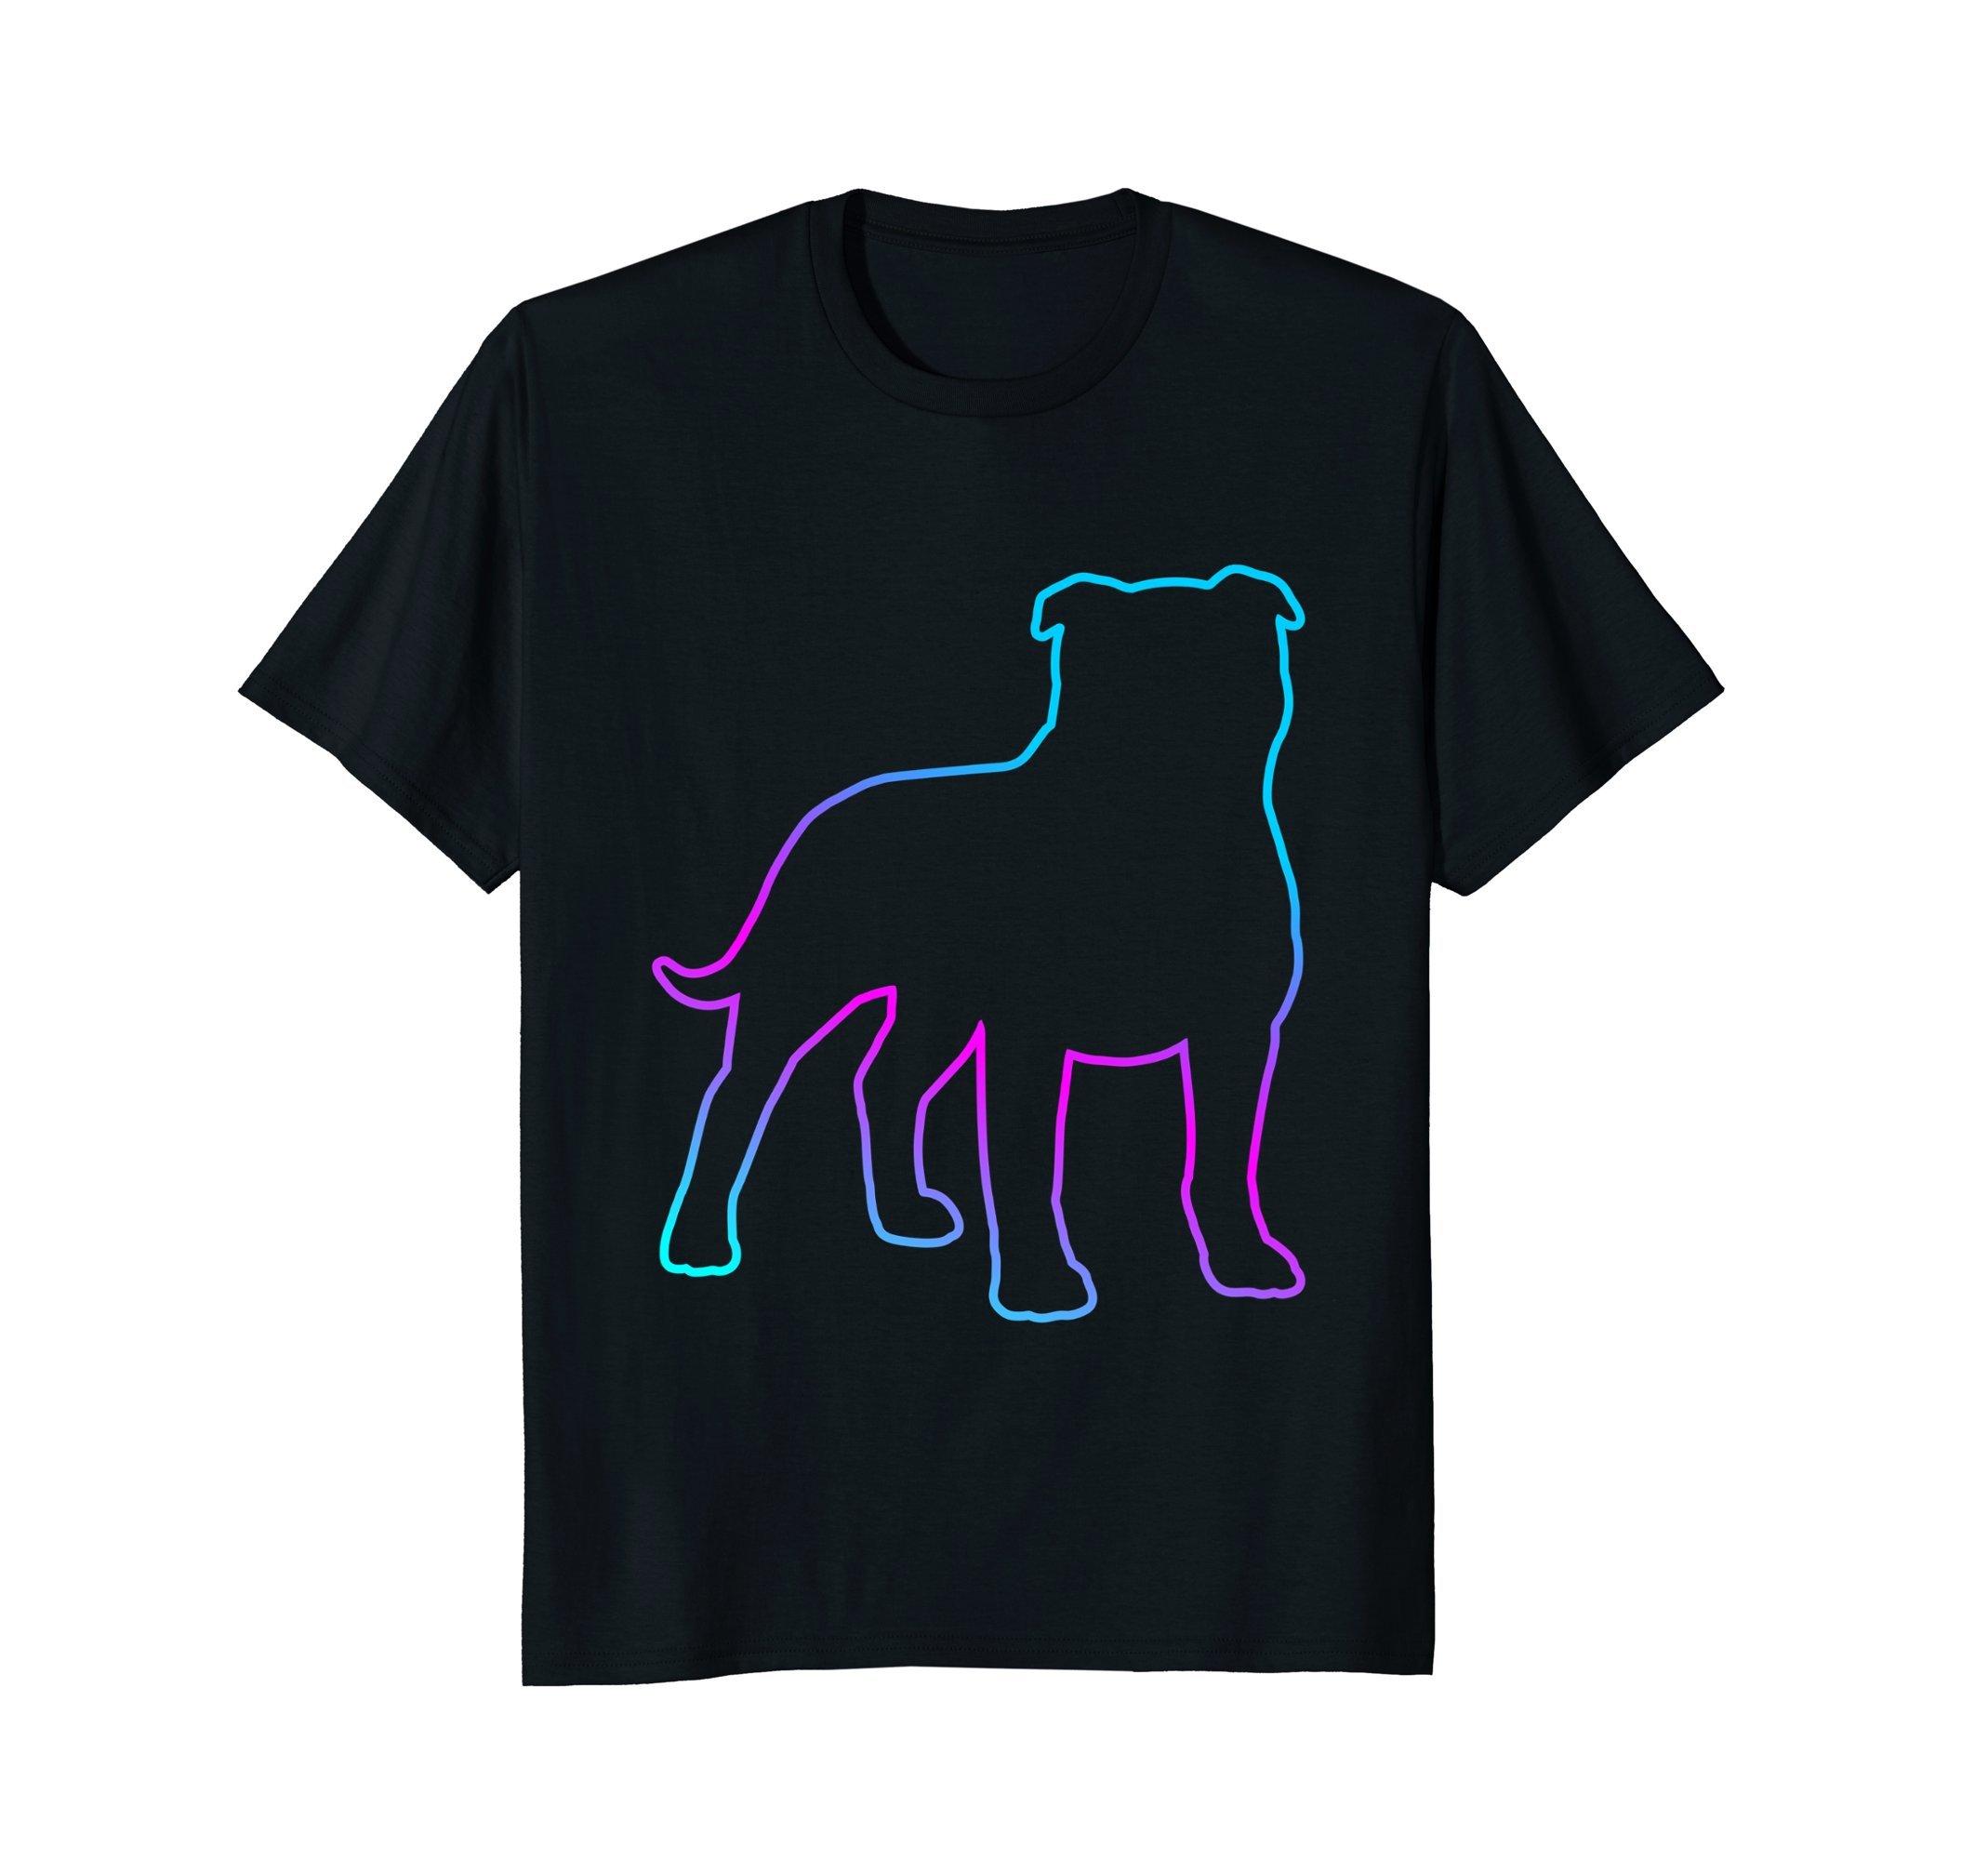 80s Retro Neon Sign Pit Bull Dog T-Shirt